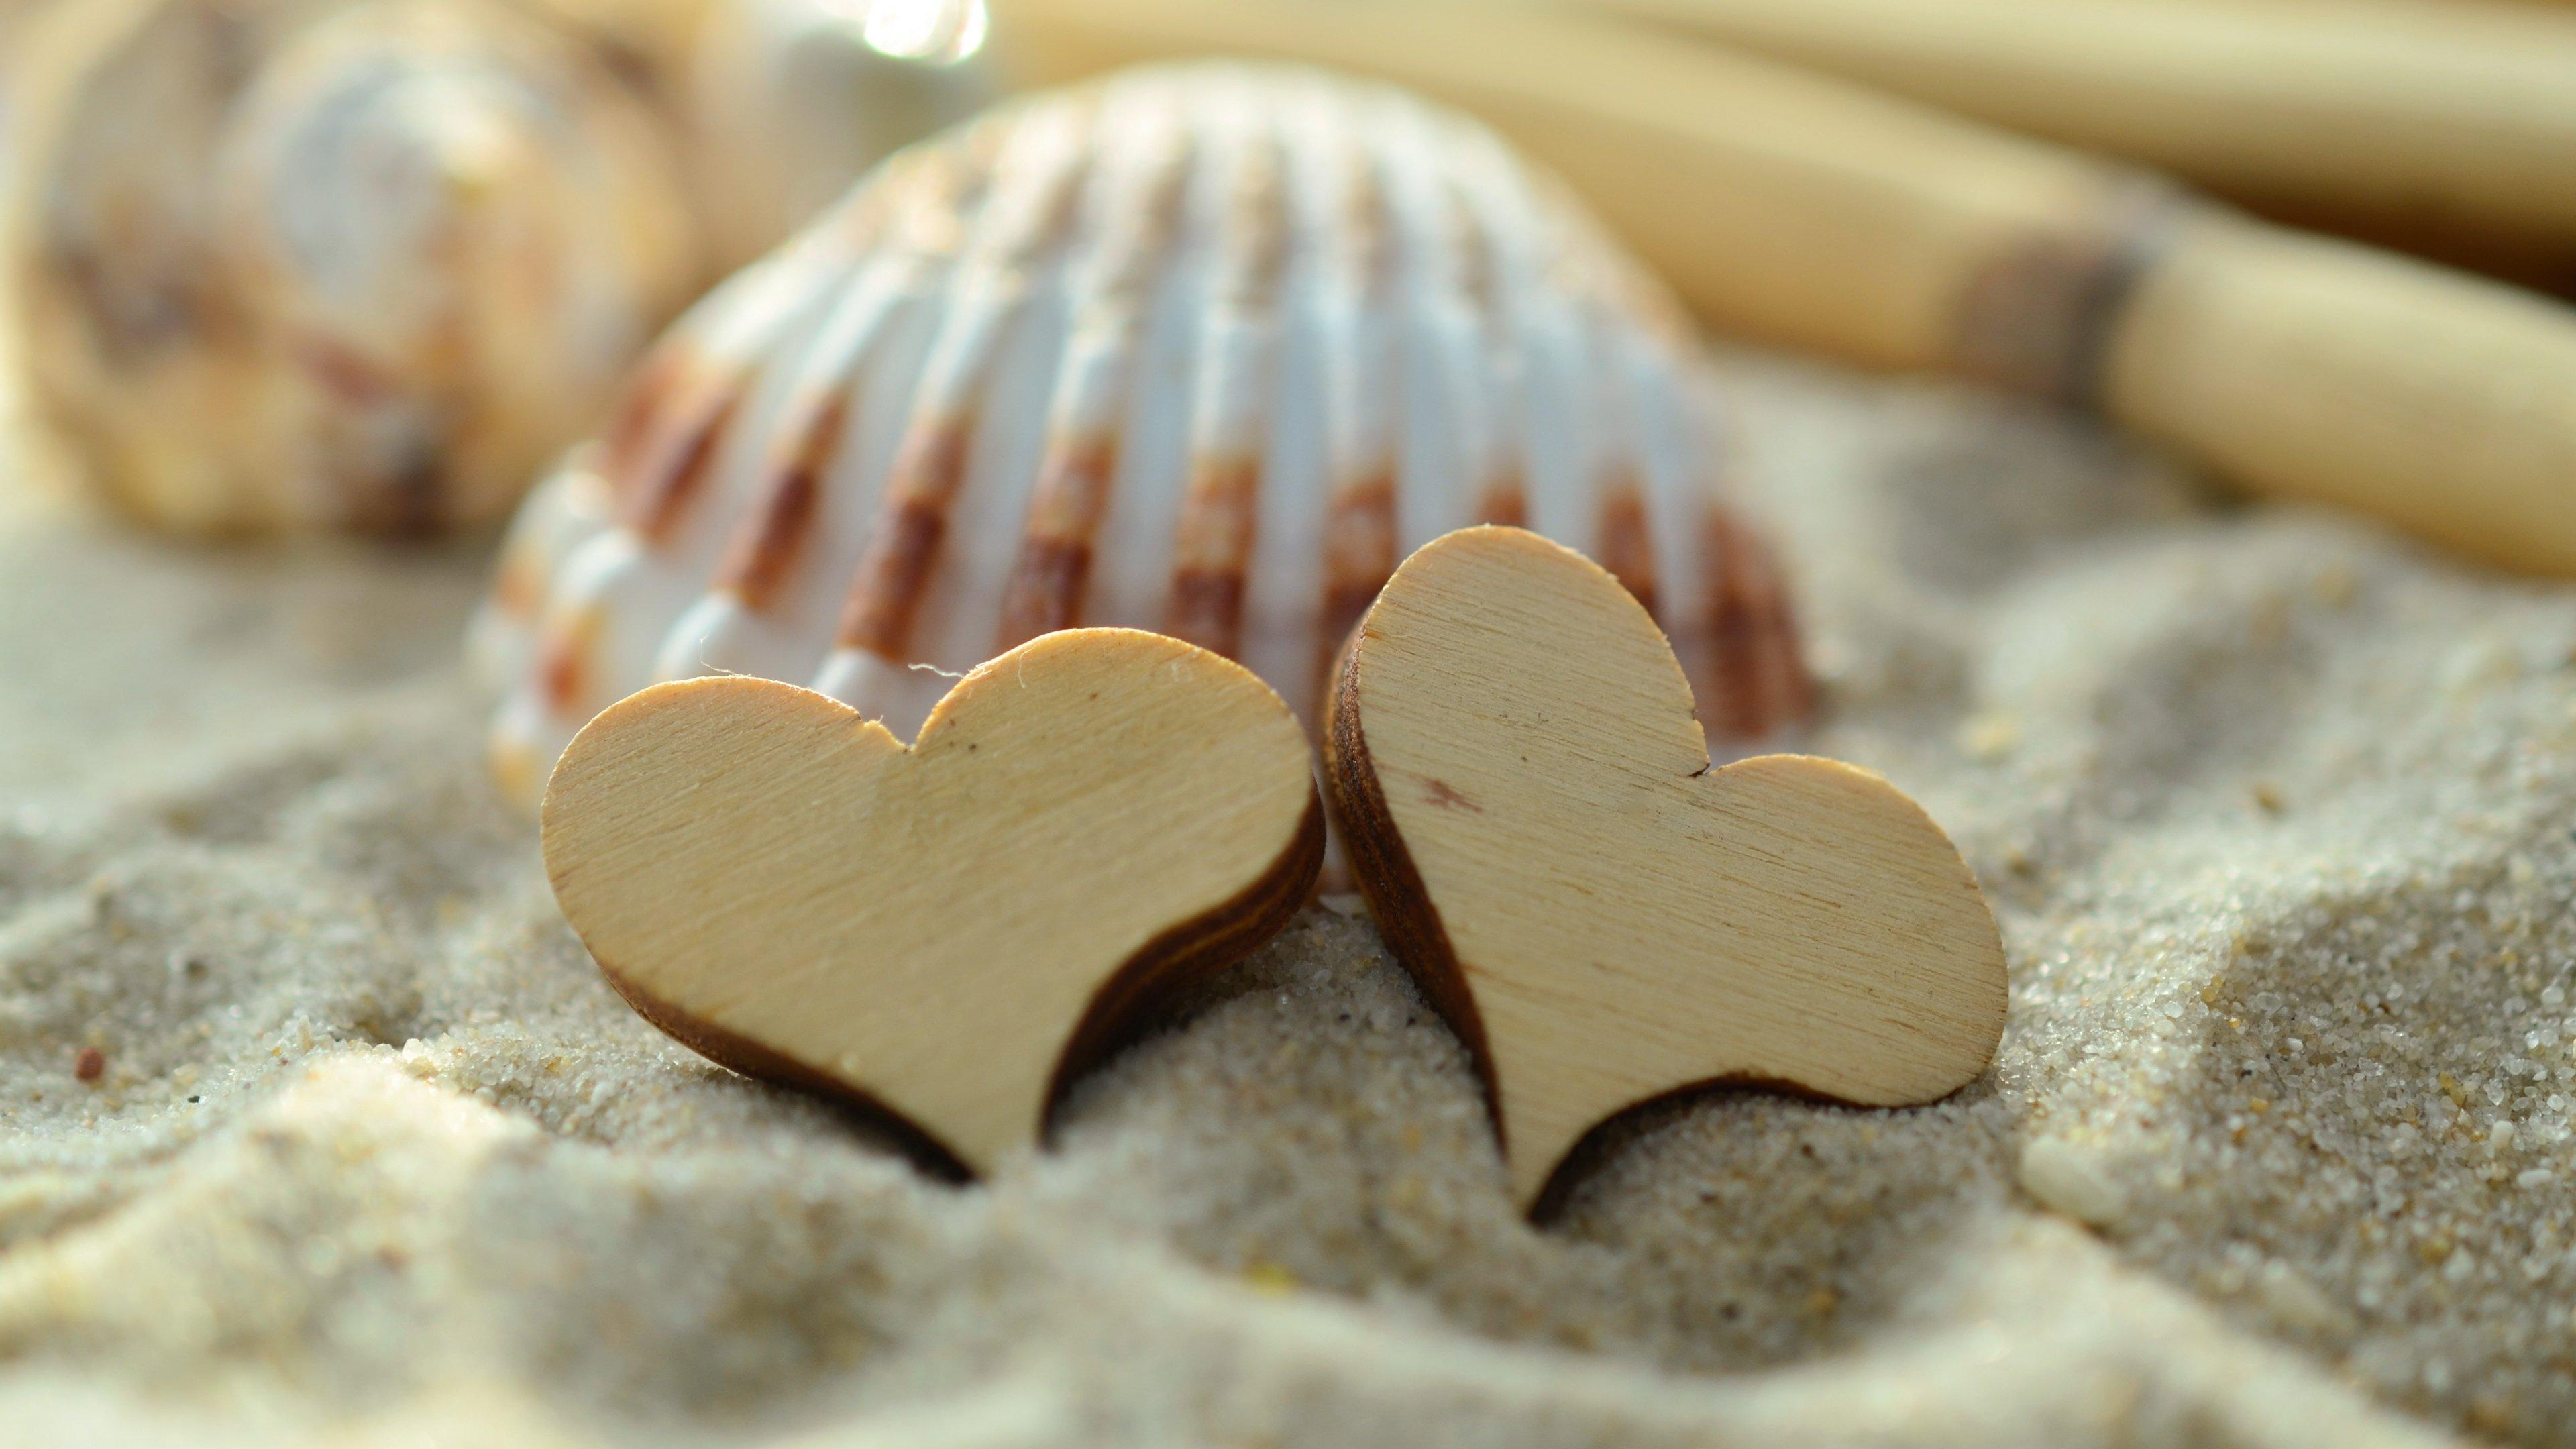 Love Sand 3840x2160